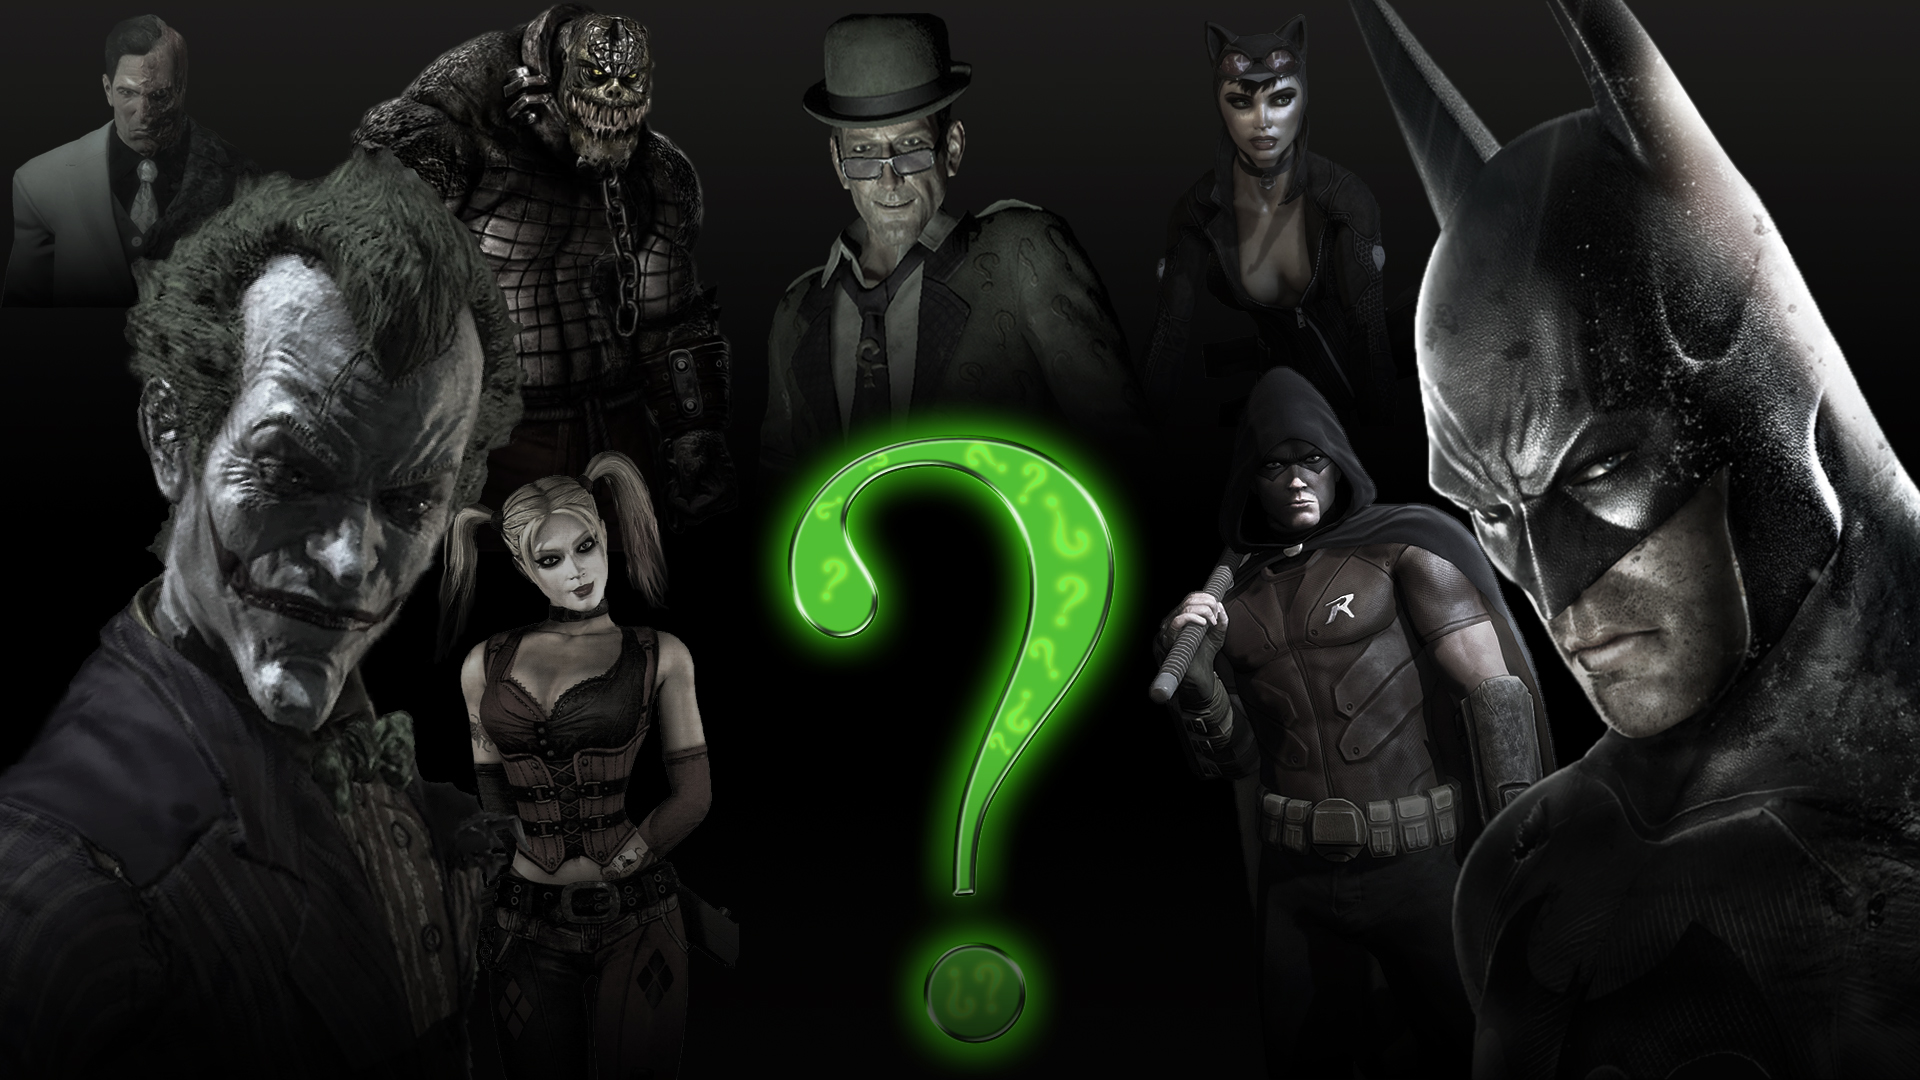 Game Batman Arkham City Batman Arkham City The Joker Riddle Wallpaper 1920x1080